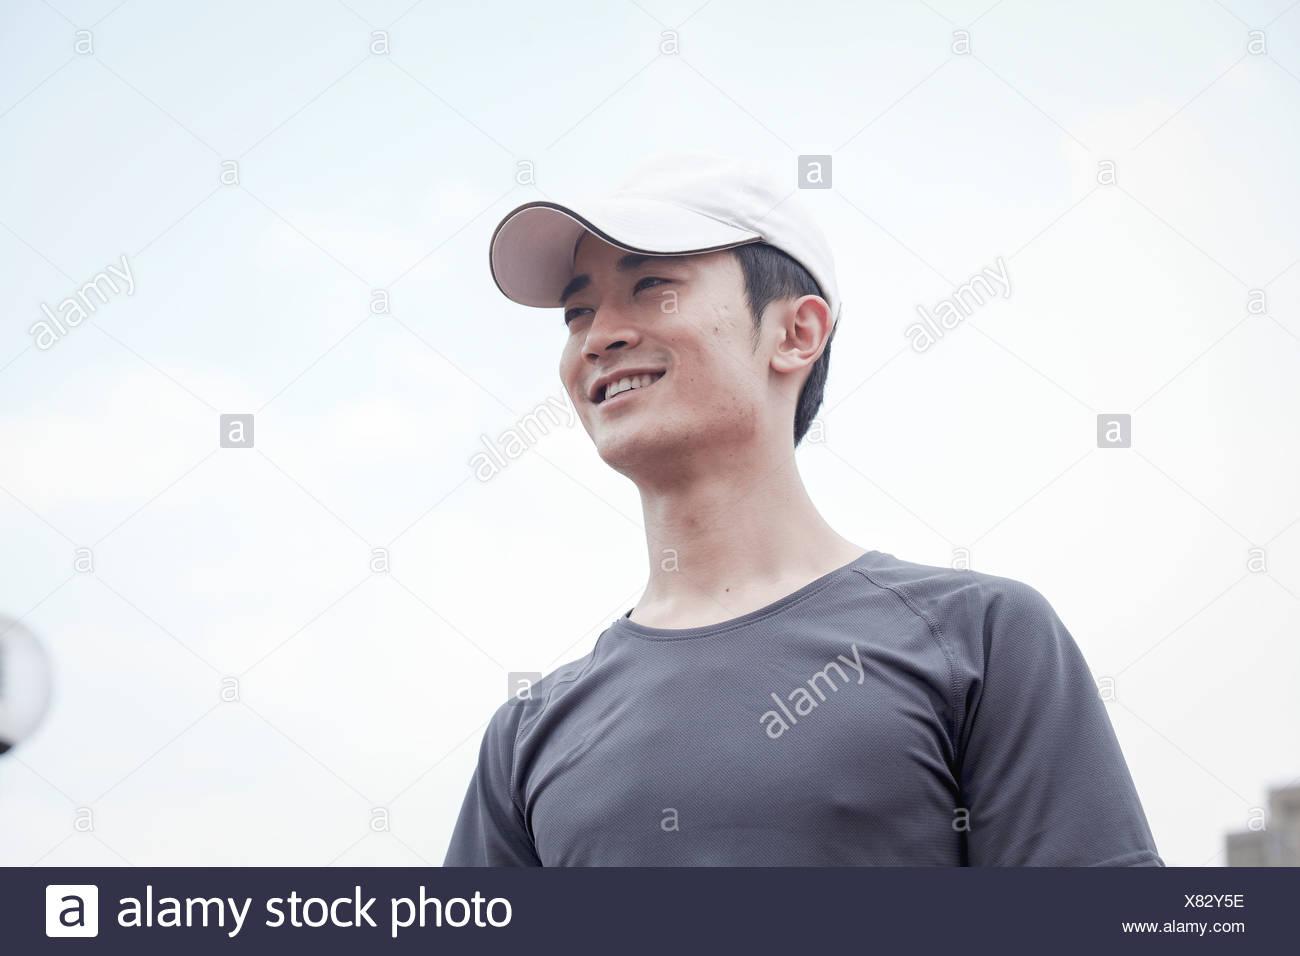 Close Up Man Wearing Baseball Immagini   Close Up Man Wearing ... 87fa5877e9a1